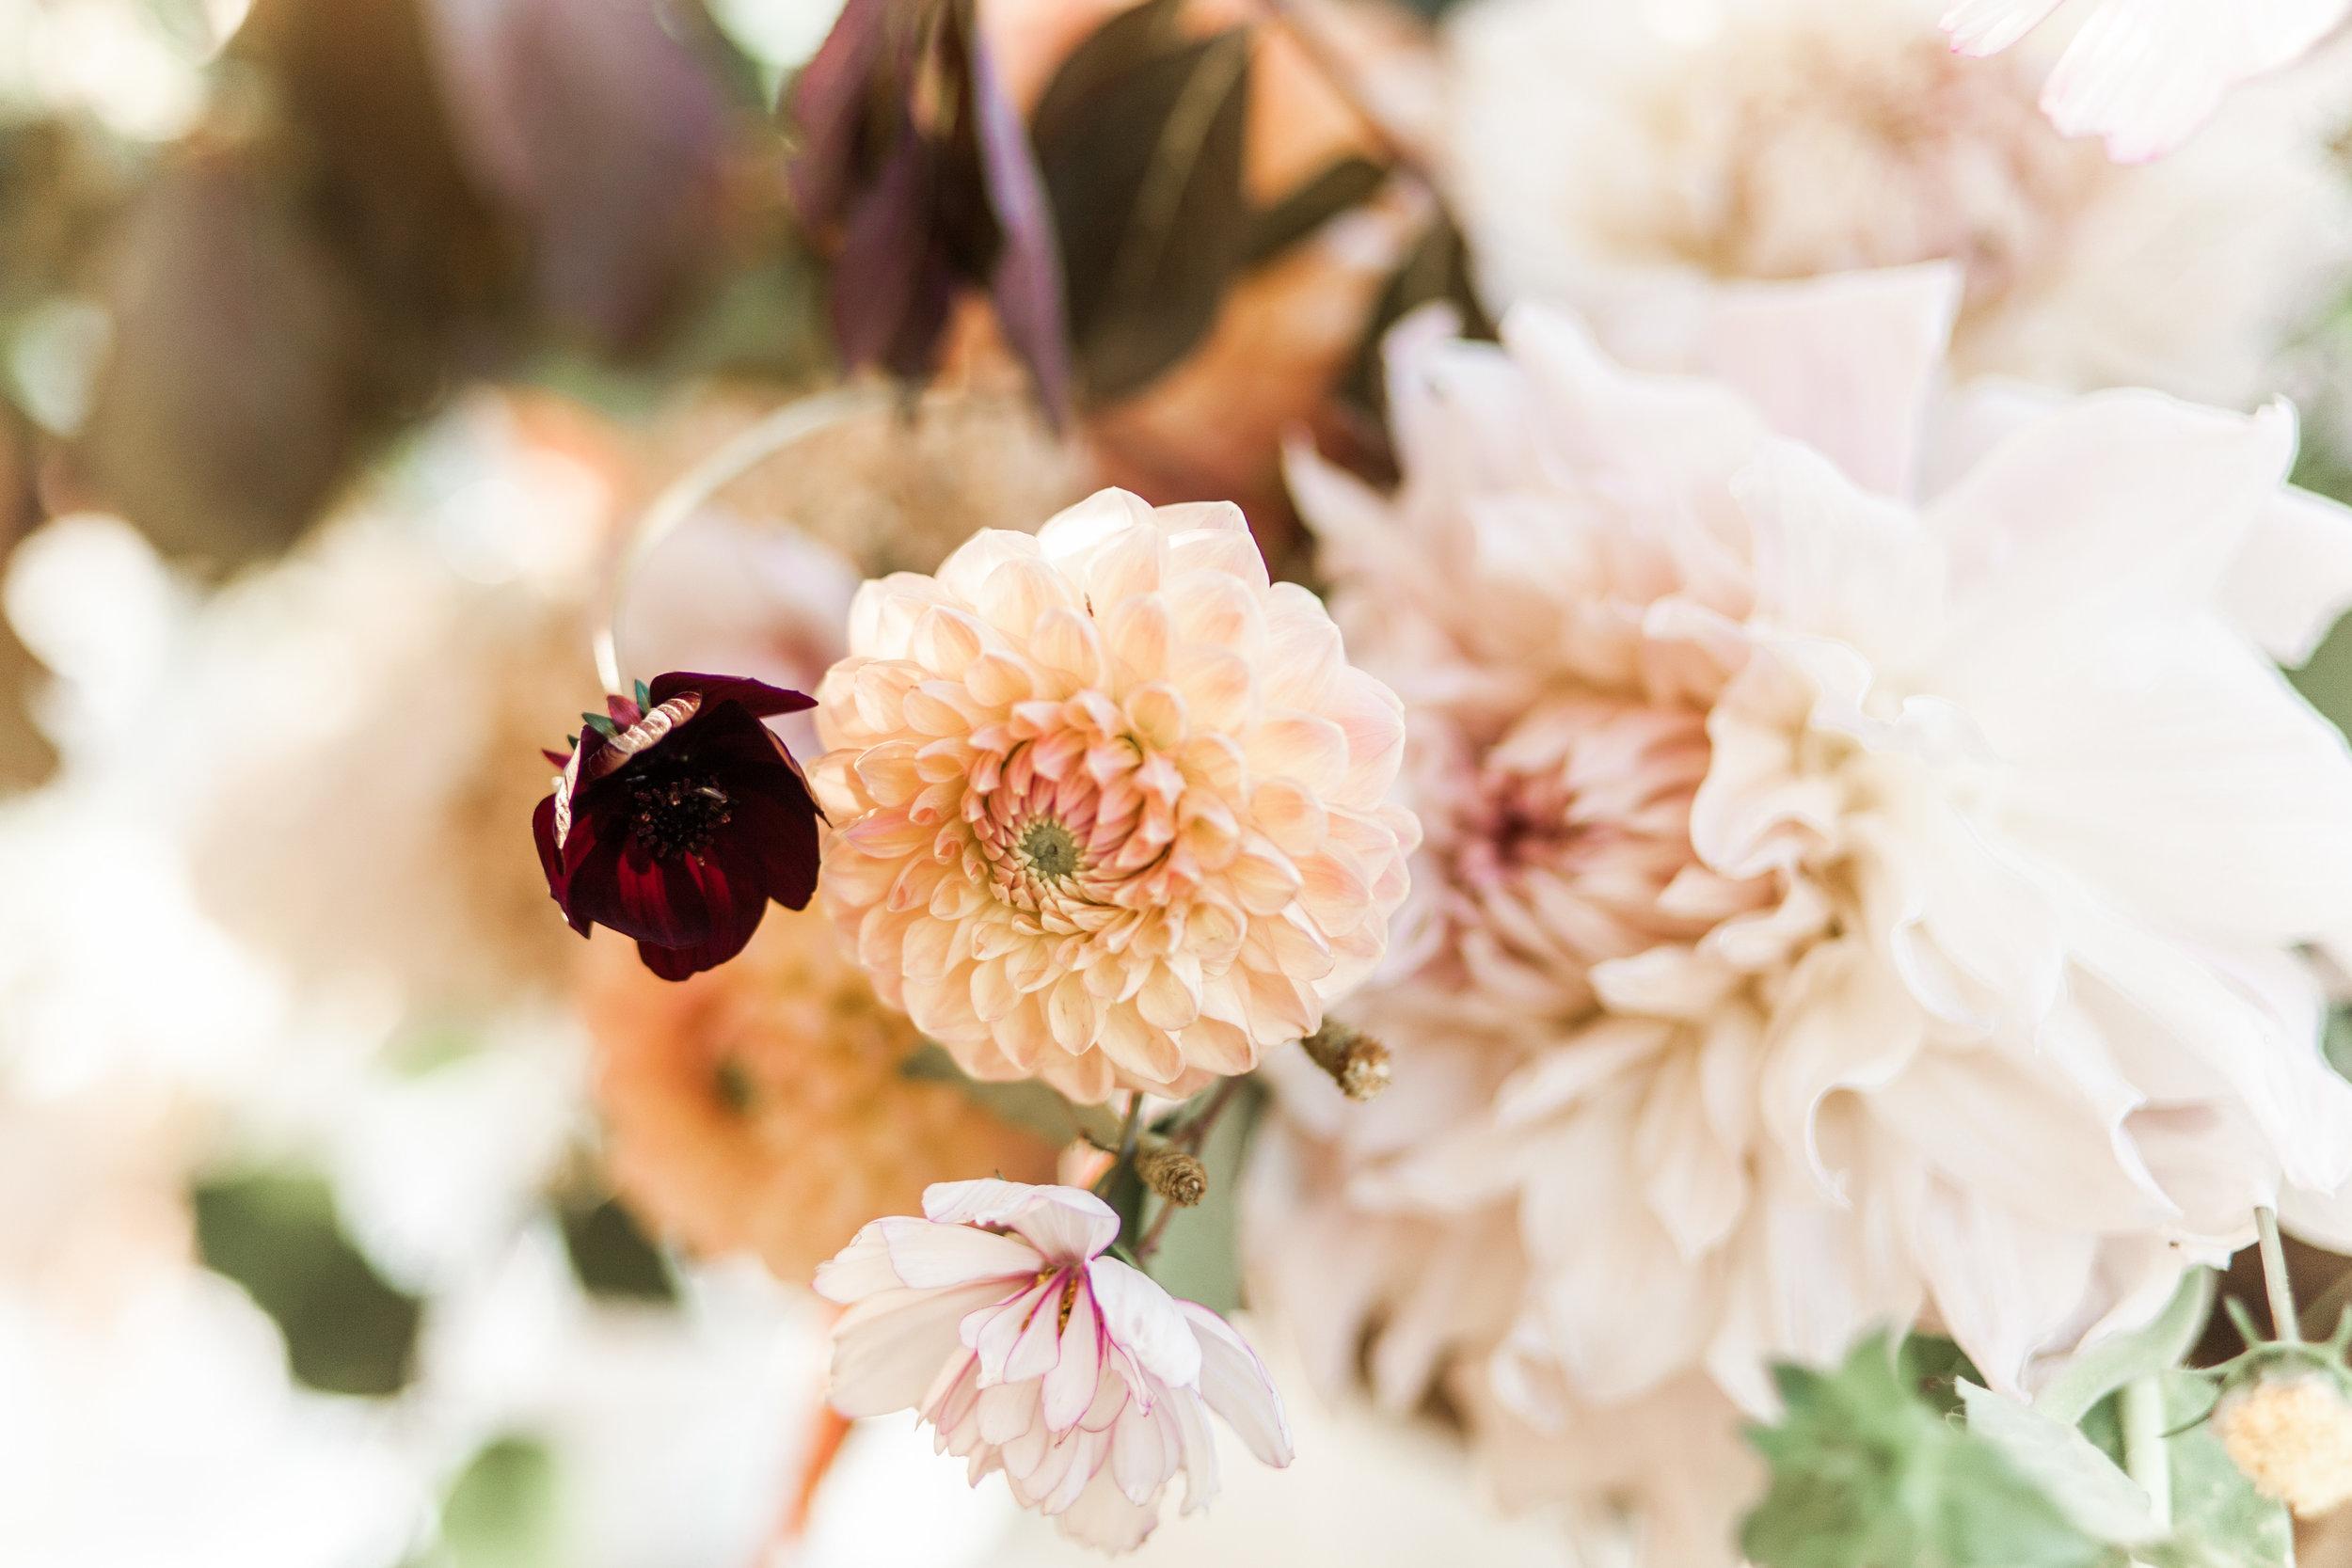 dahlia and chocolate cosmos wedding flowers